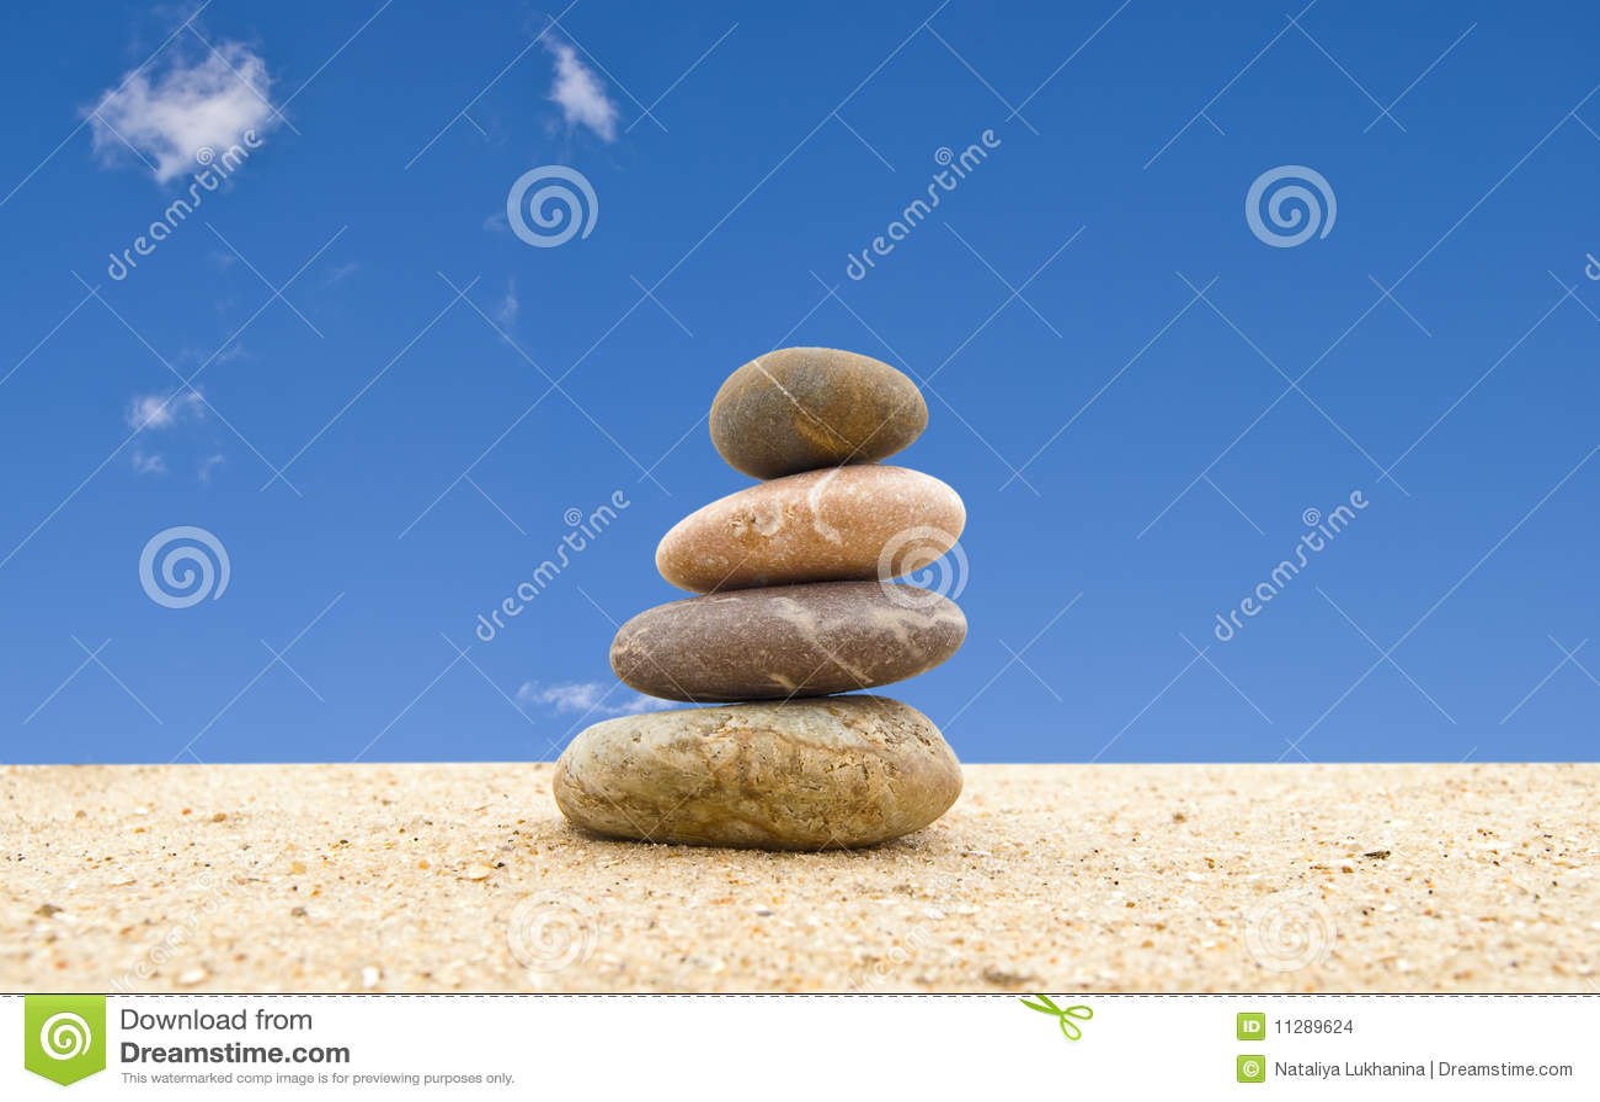 The balanced stones on sand